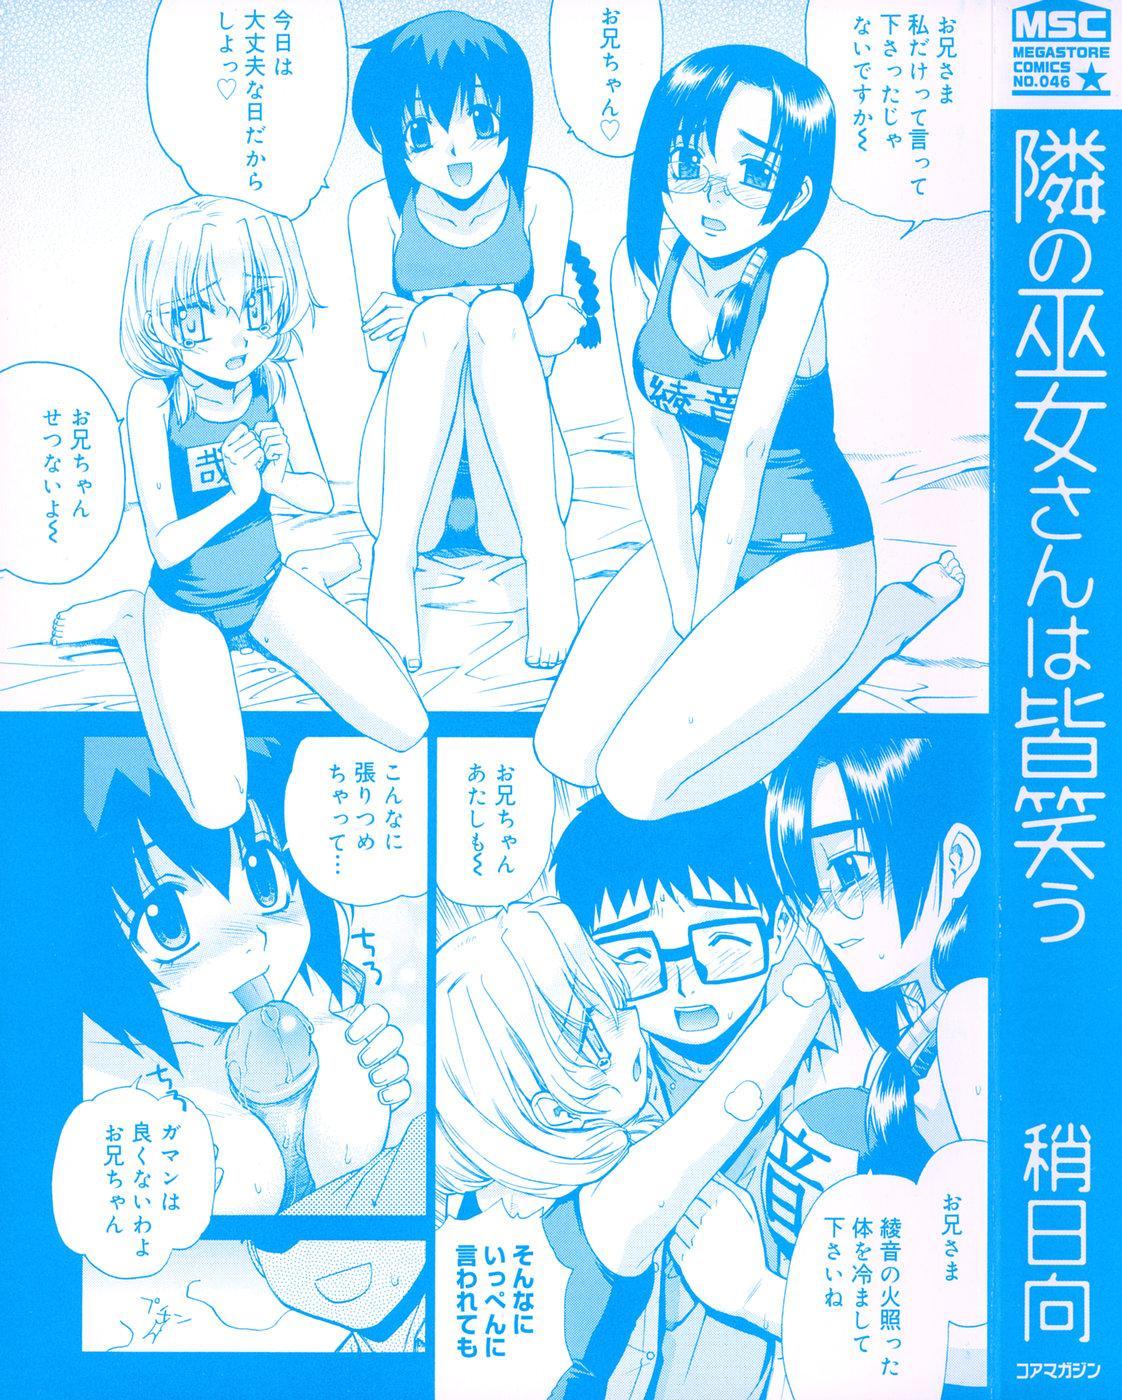 [Yaya Hinata] Tonari no Miko-san wa Minna Warau - The next shrine maidens smile in everyone. 1